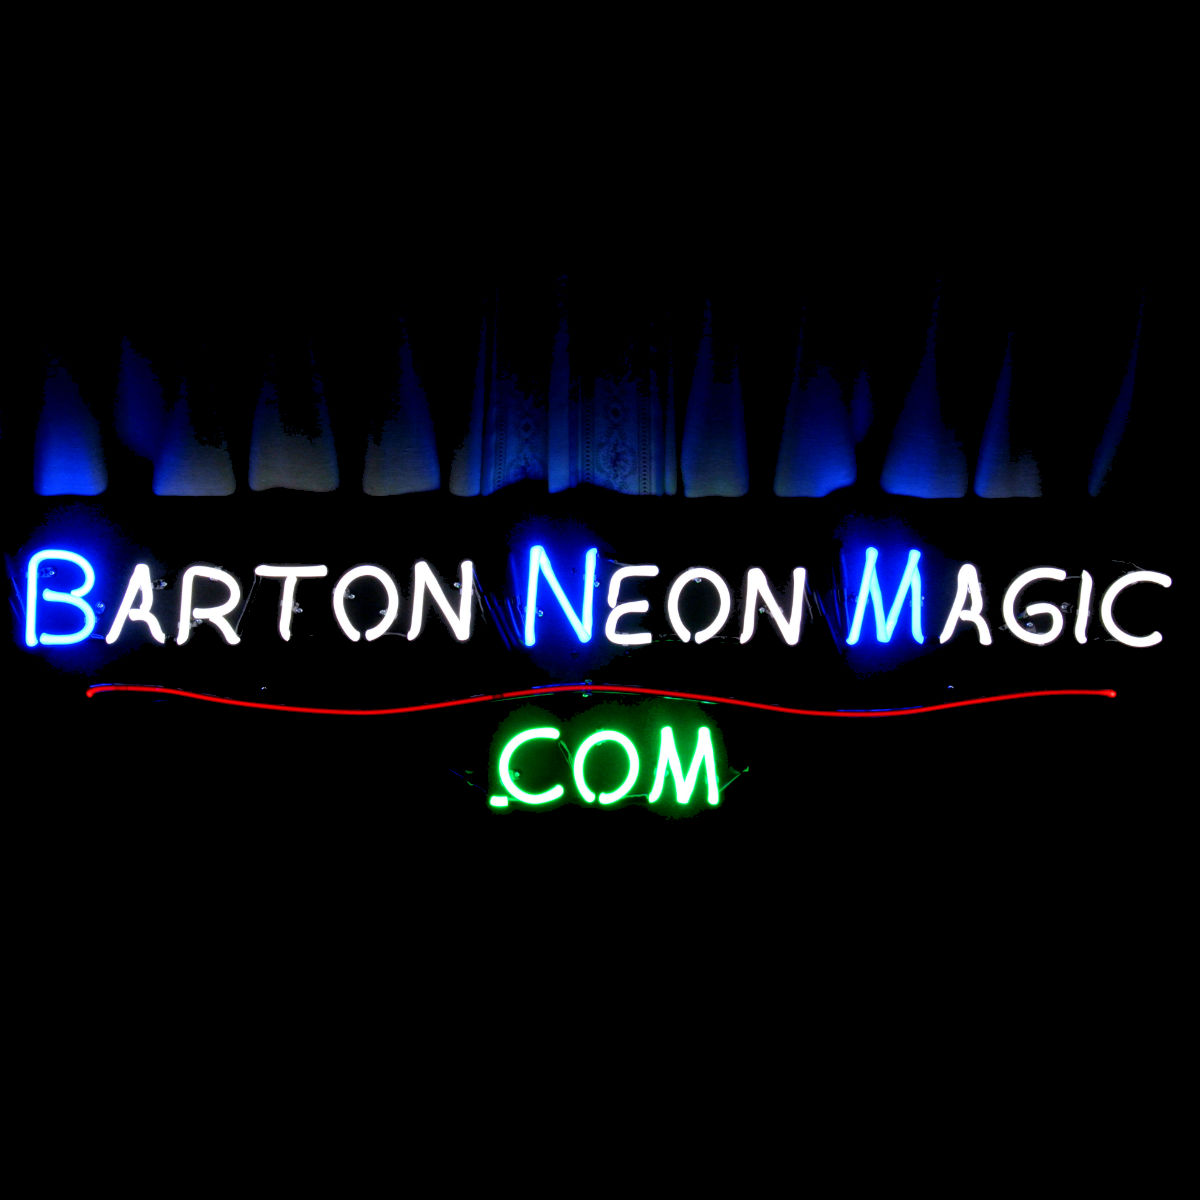 BartonNeonMagic.com - High End Neon by John Barton - Famous USA Neon Glass Artist